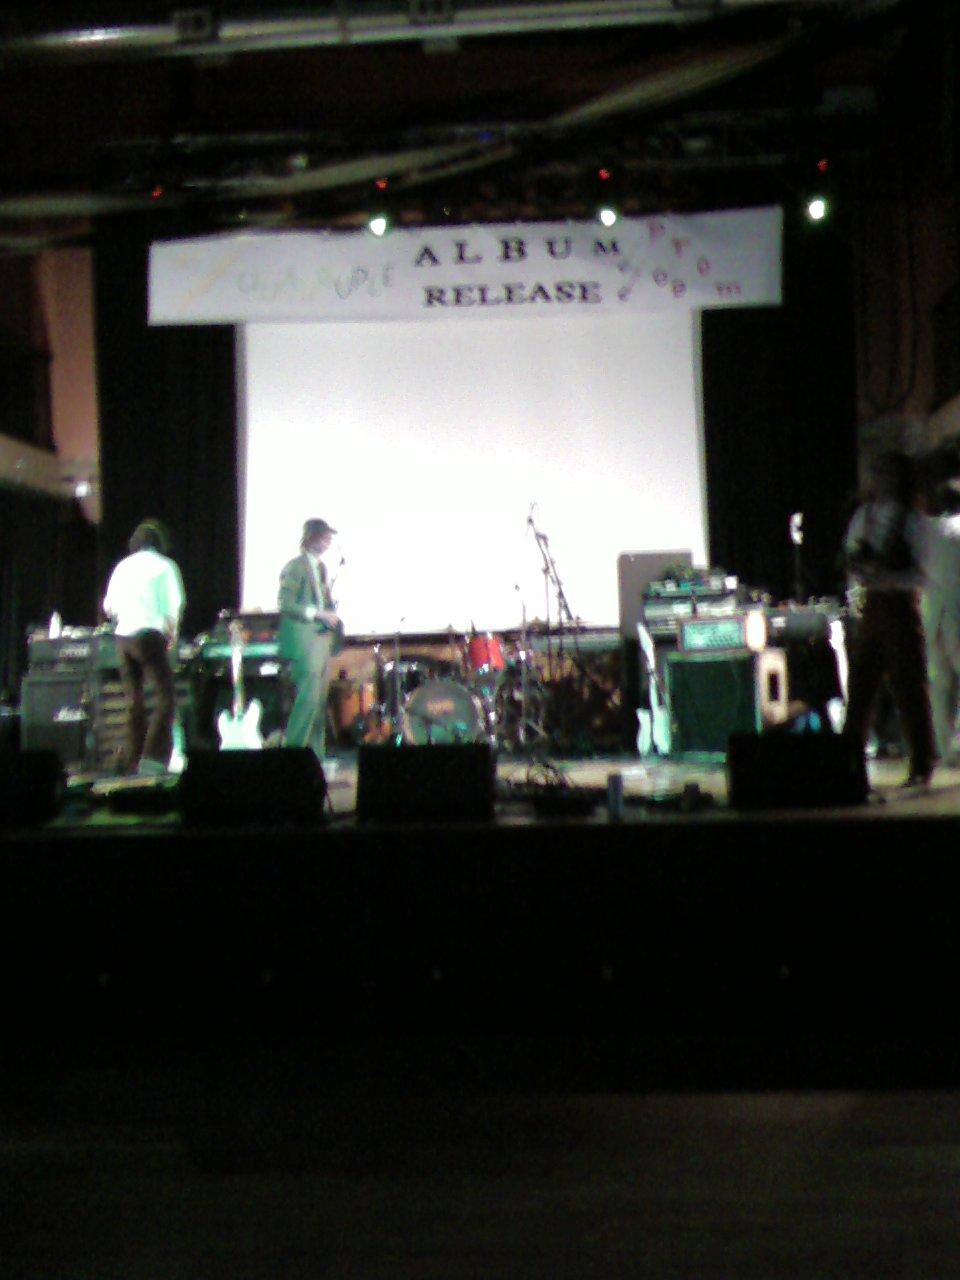 Album Release Prom stage setup